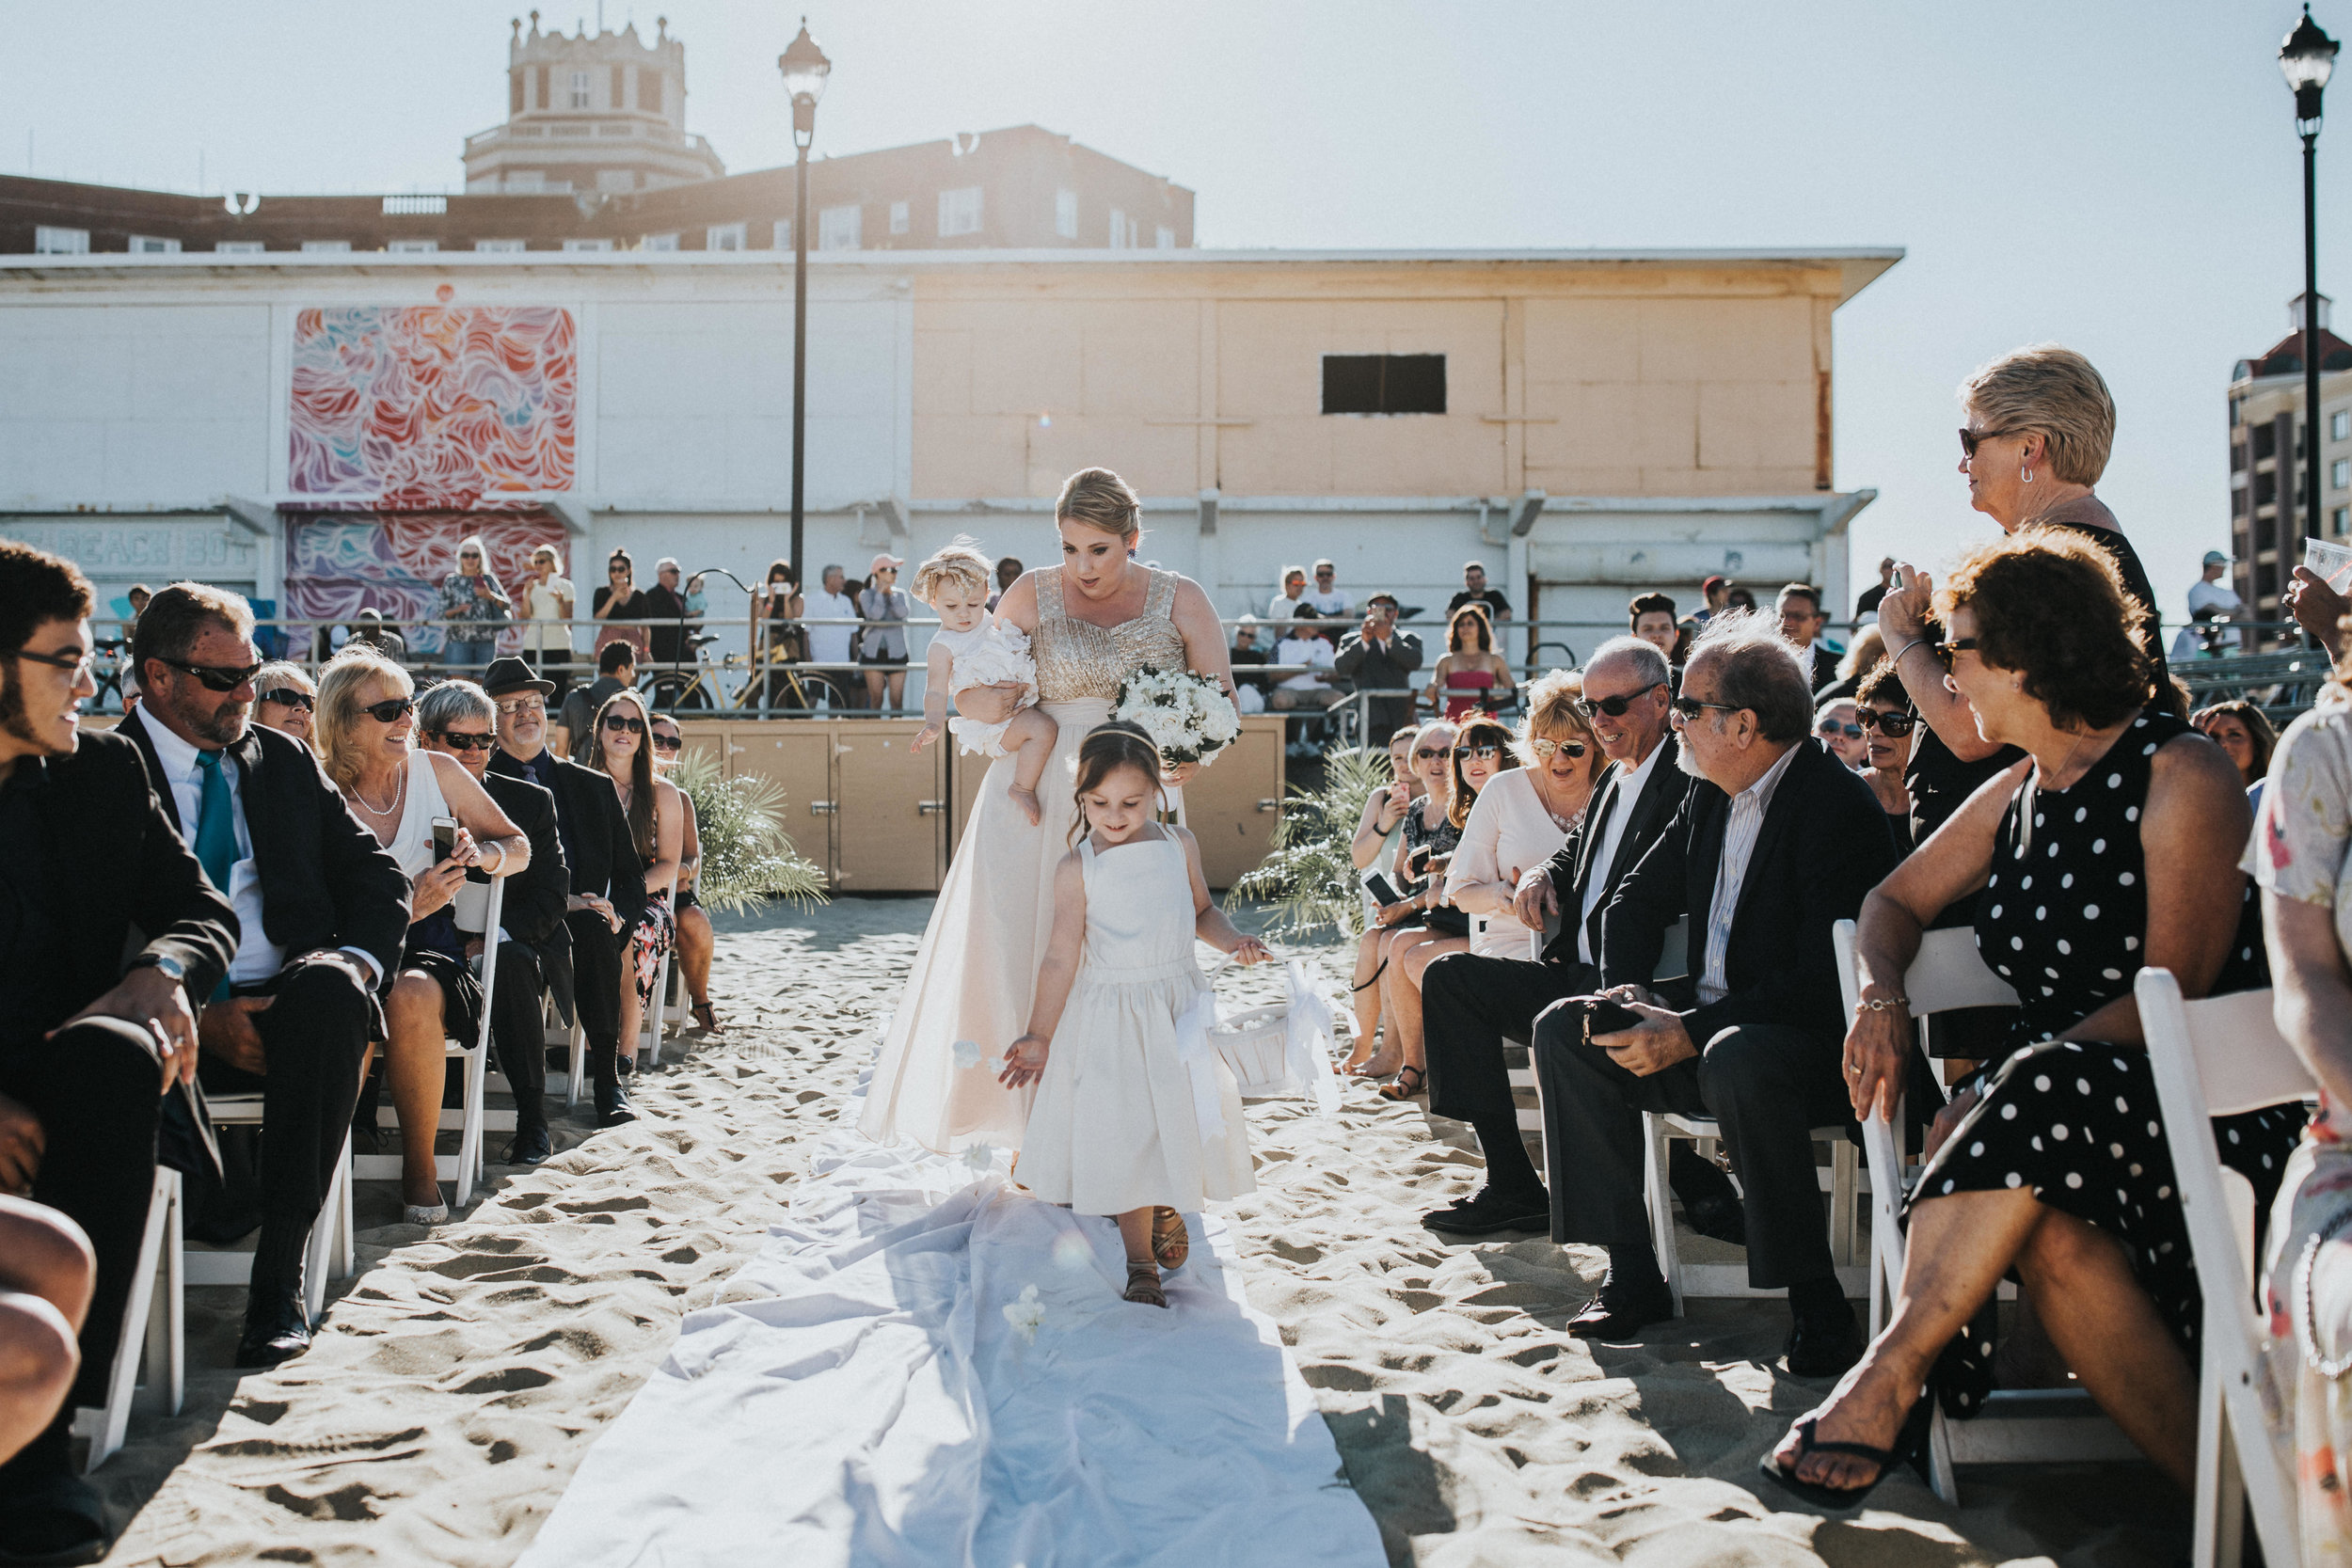 JennaLynnPhotography-NJWeddingPhotographer-Wedding-TheBerkeley-AsburyPark-Allison&Michael-Ceremony-17.jpg